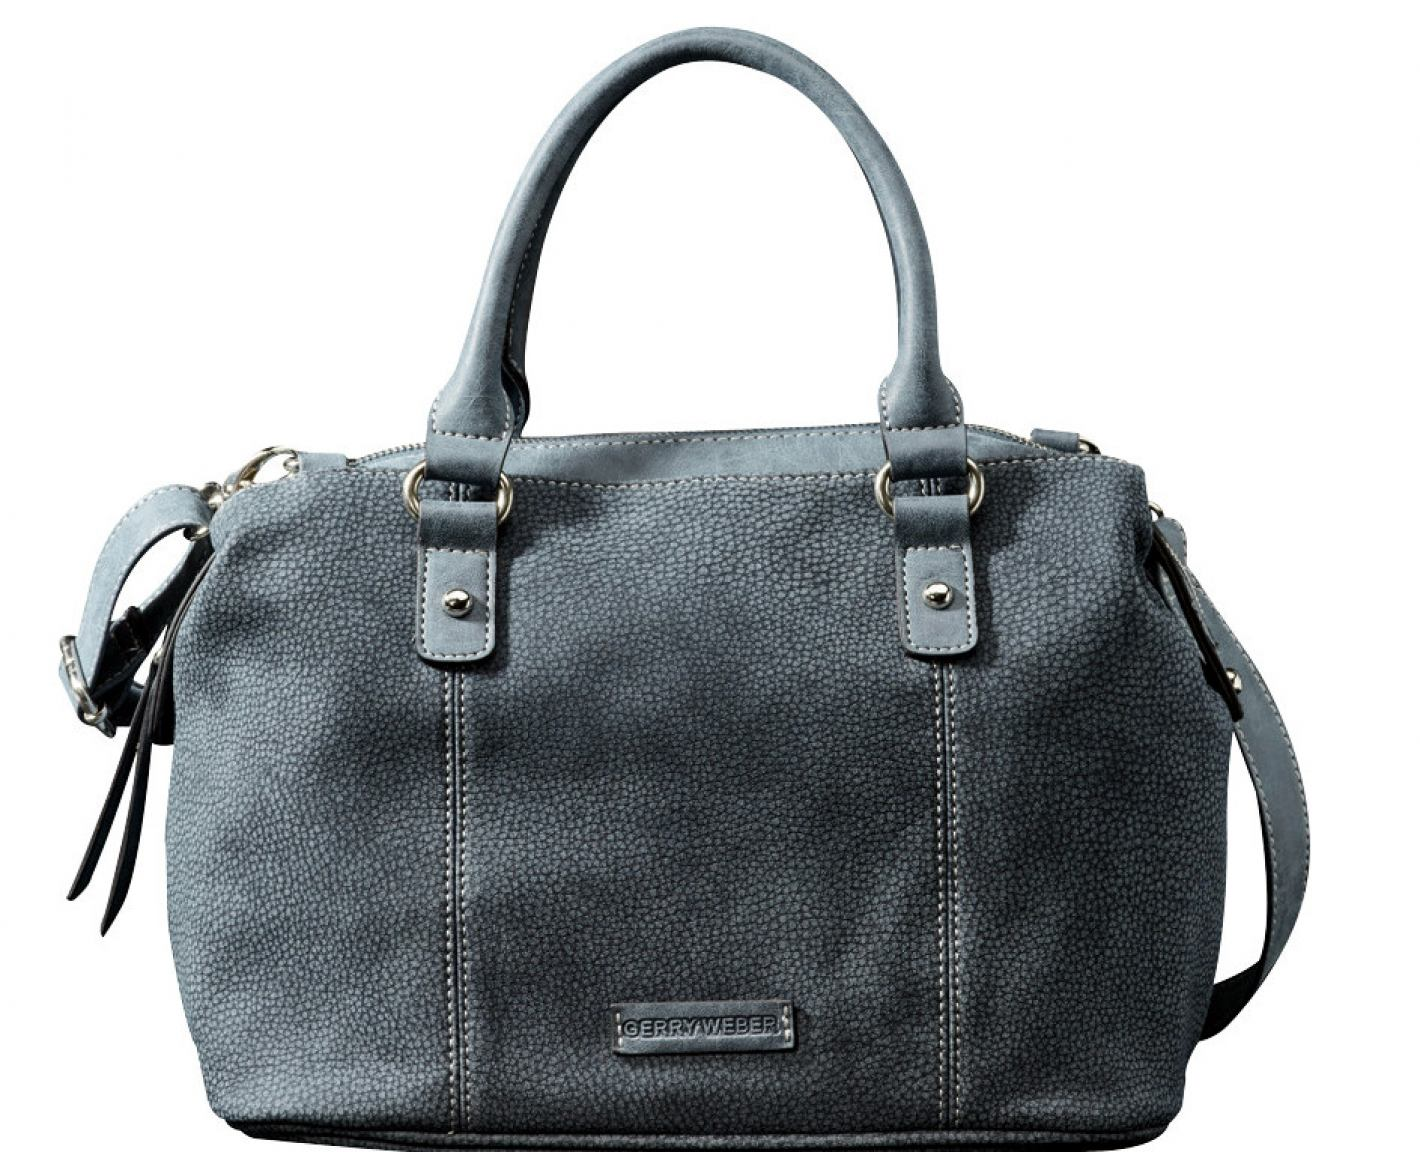 gerry weber handtasche m my way dunkelblau bags more. Black Bedroom Furniture Sets. Home Design Ideas